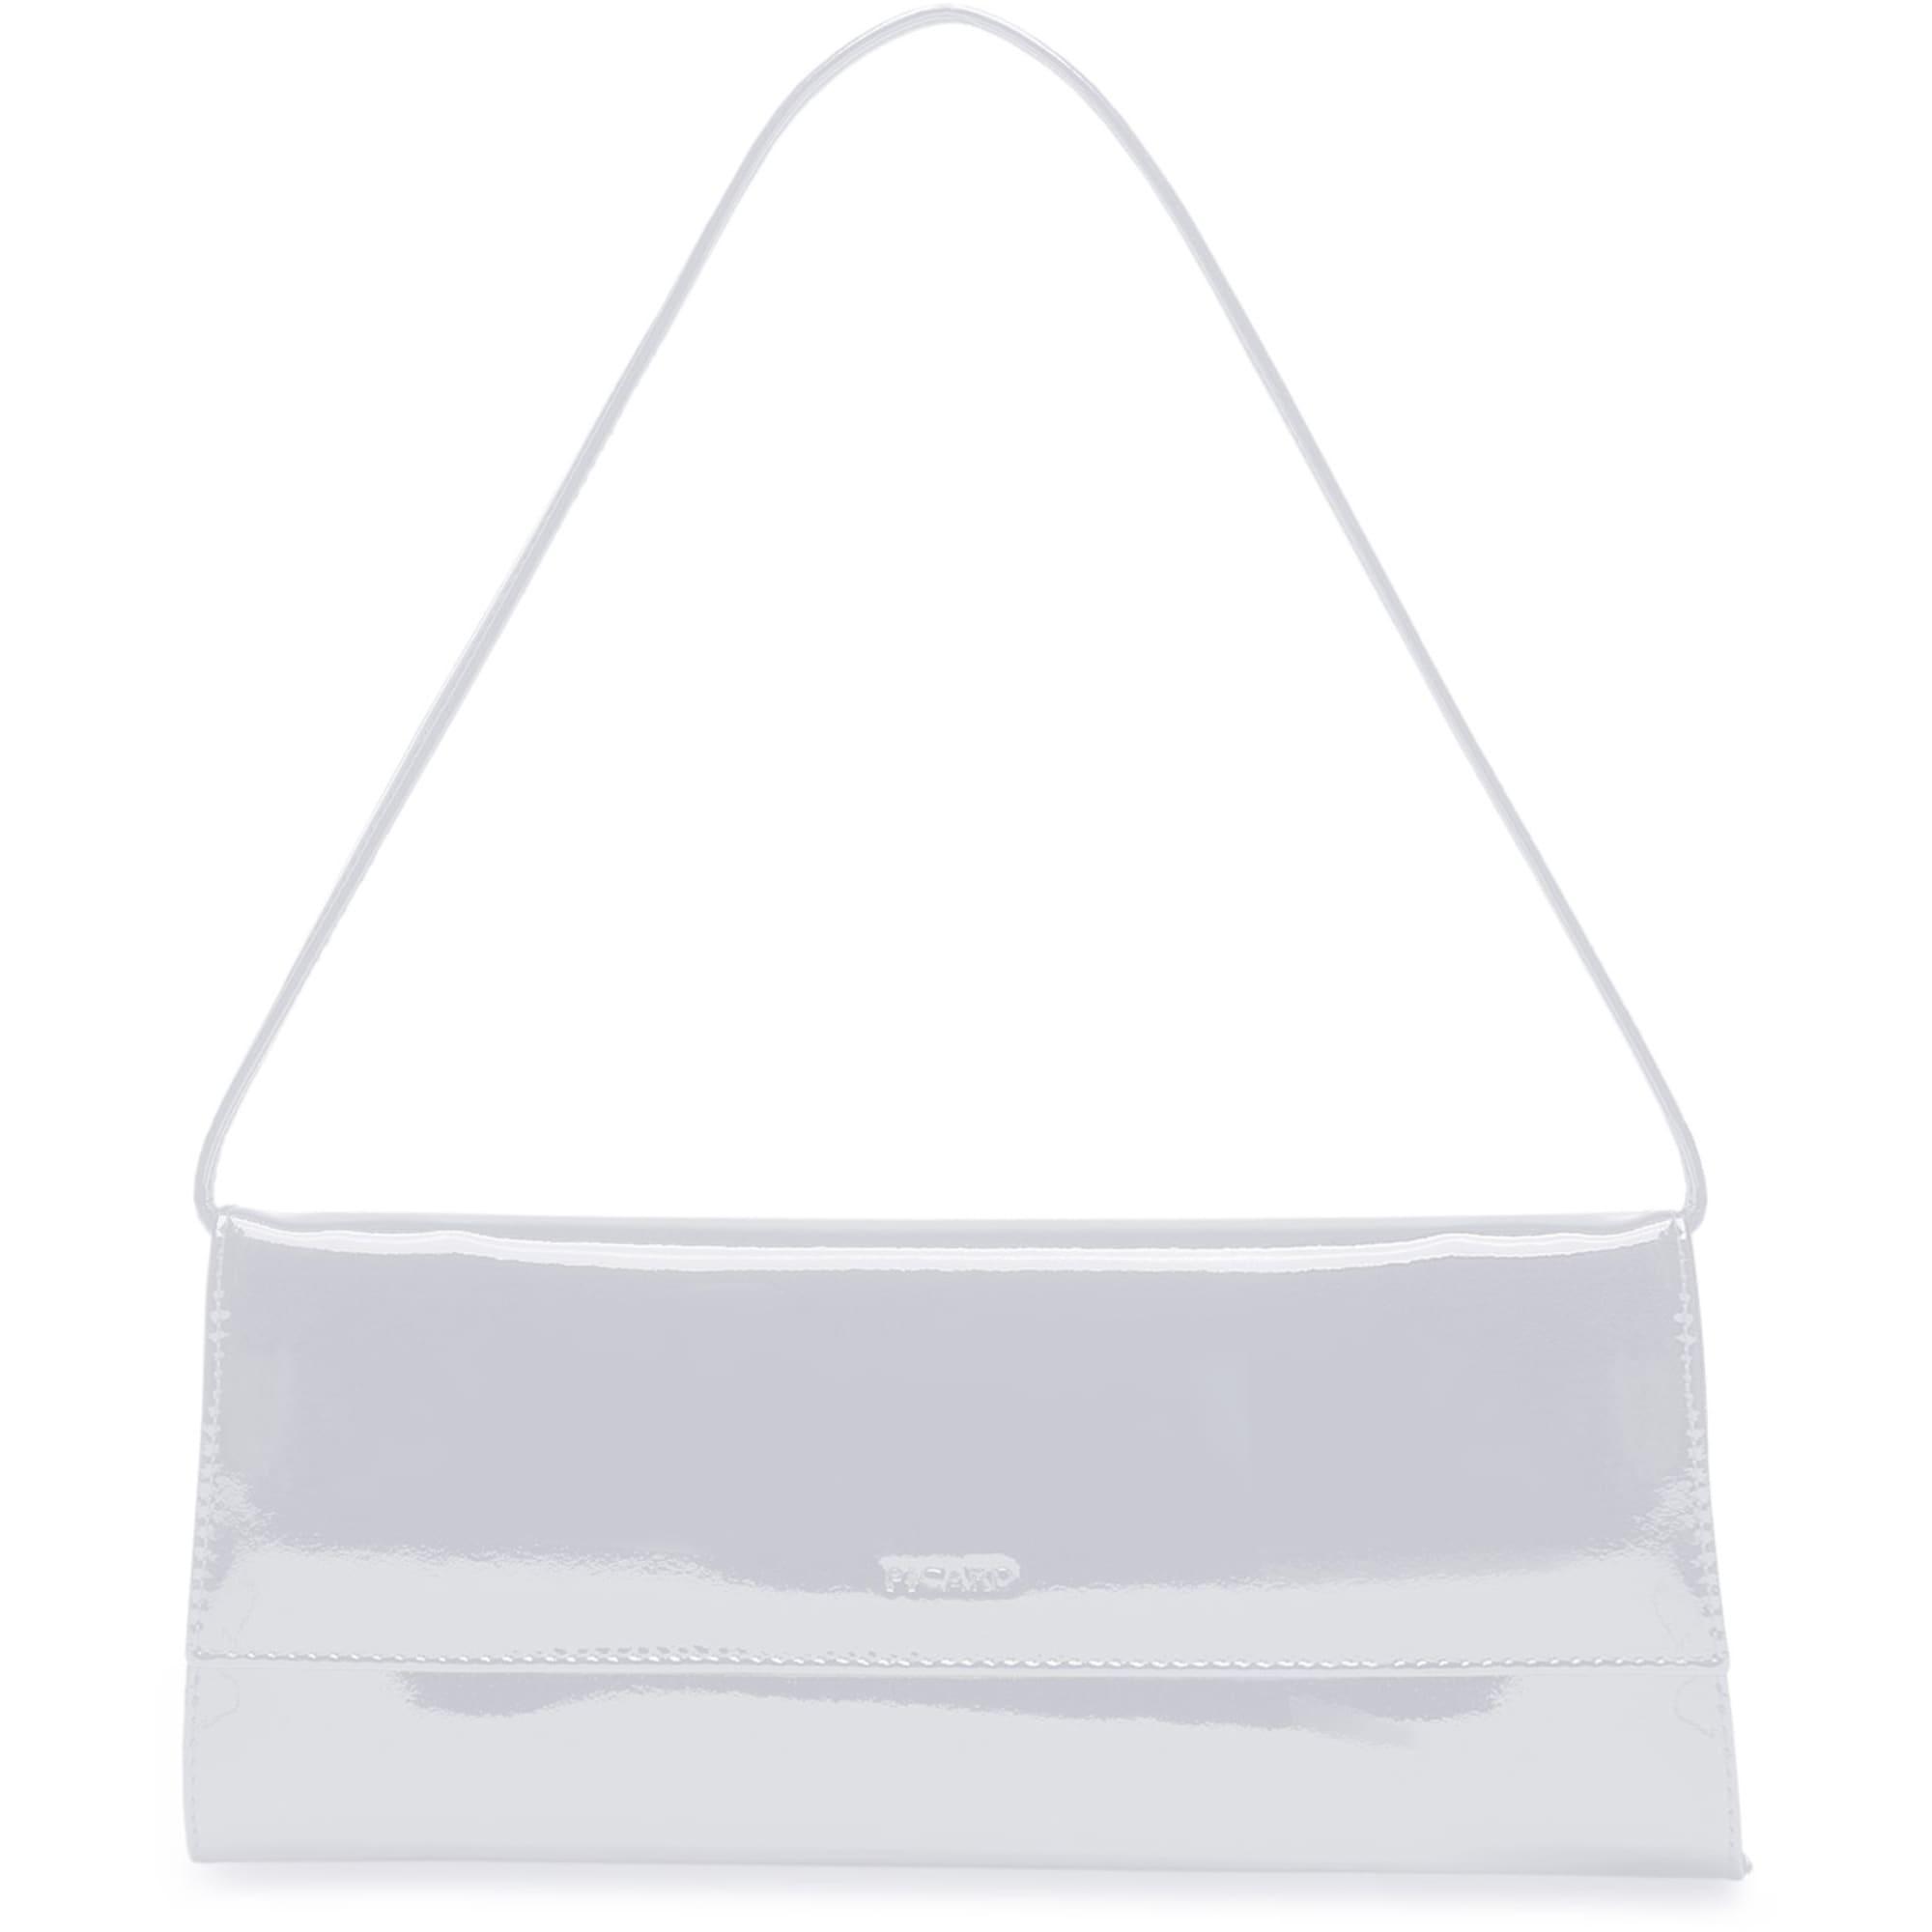 picard - Auguri Damentasche Leder 26 cm